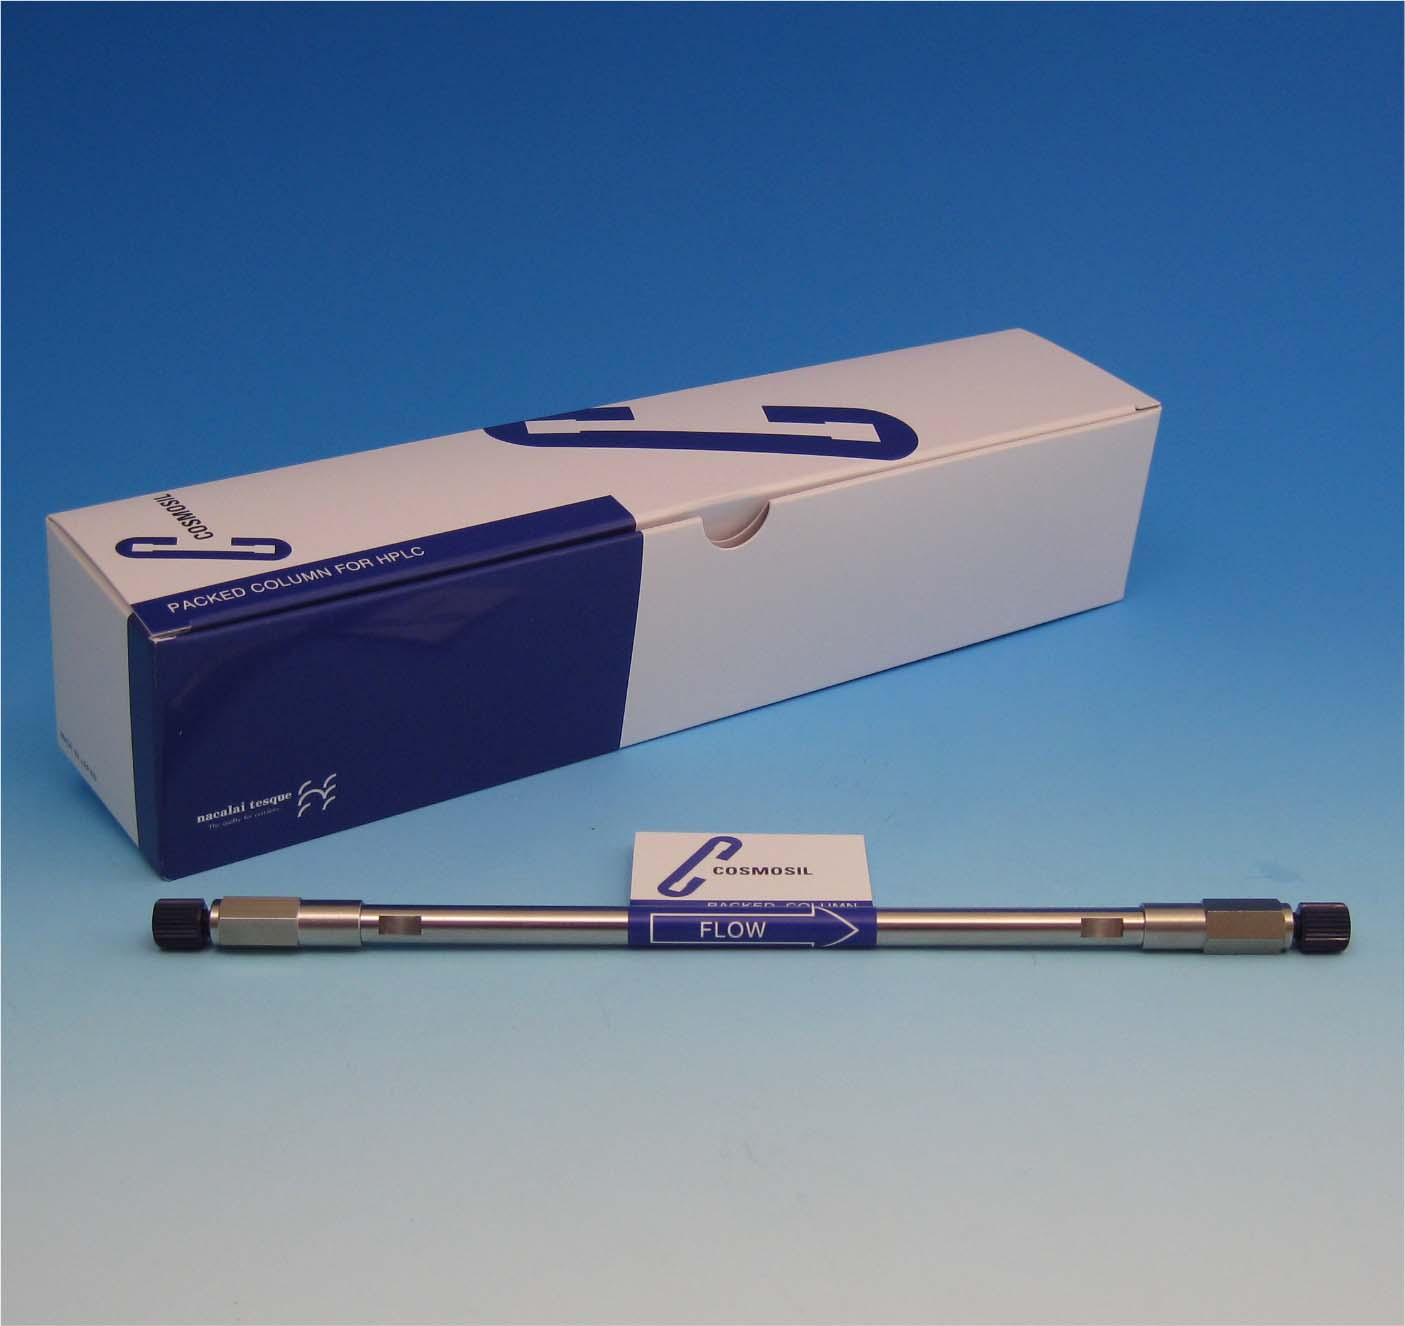 COSMOSIL(R) 5C18-MS-Ⅱ Packed Column 1.0mmI.D.x150mm